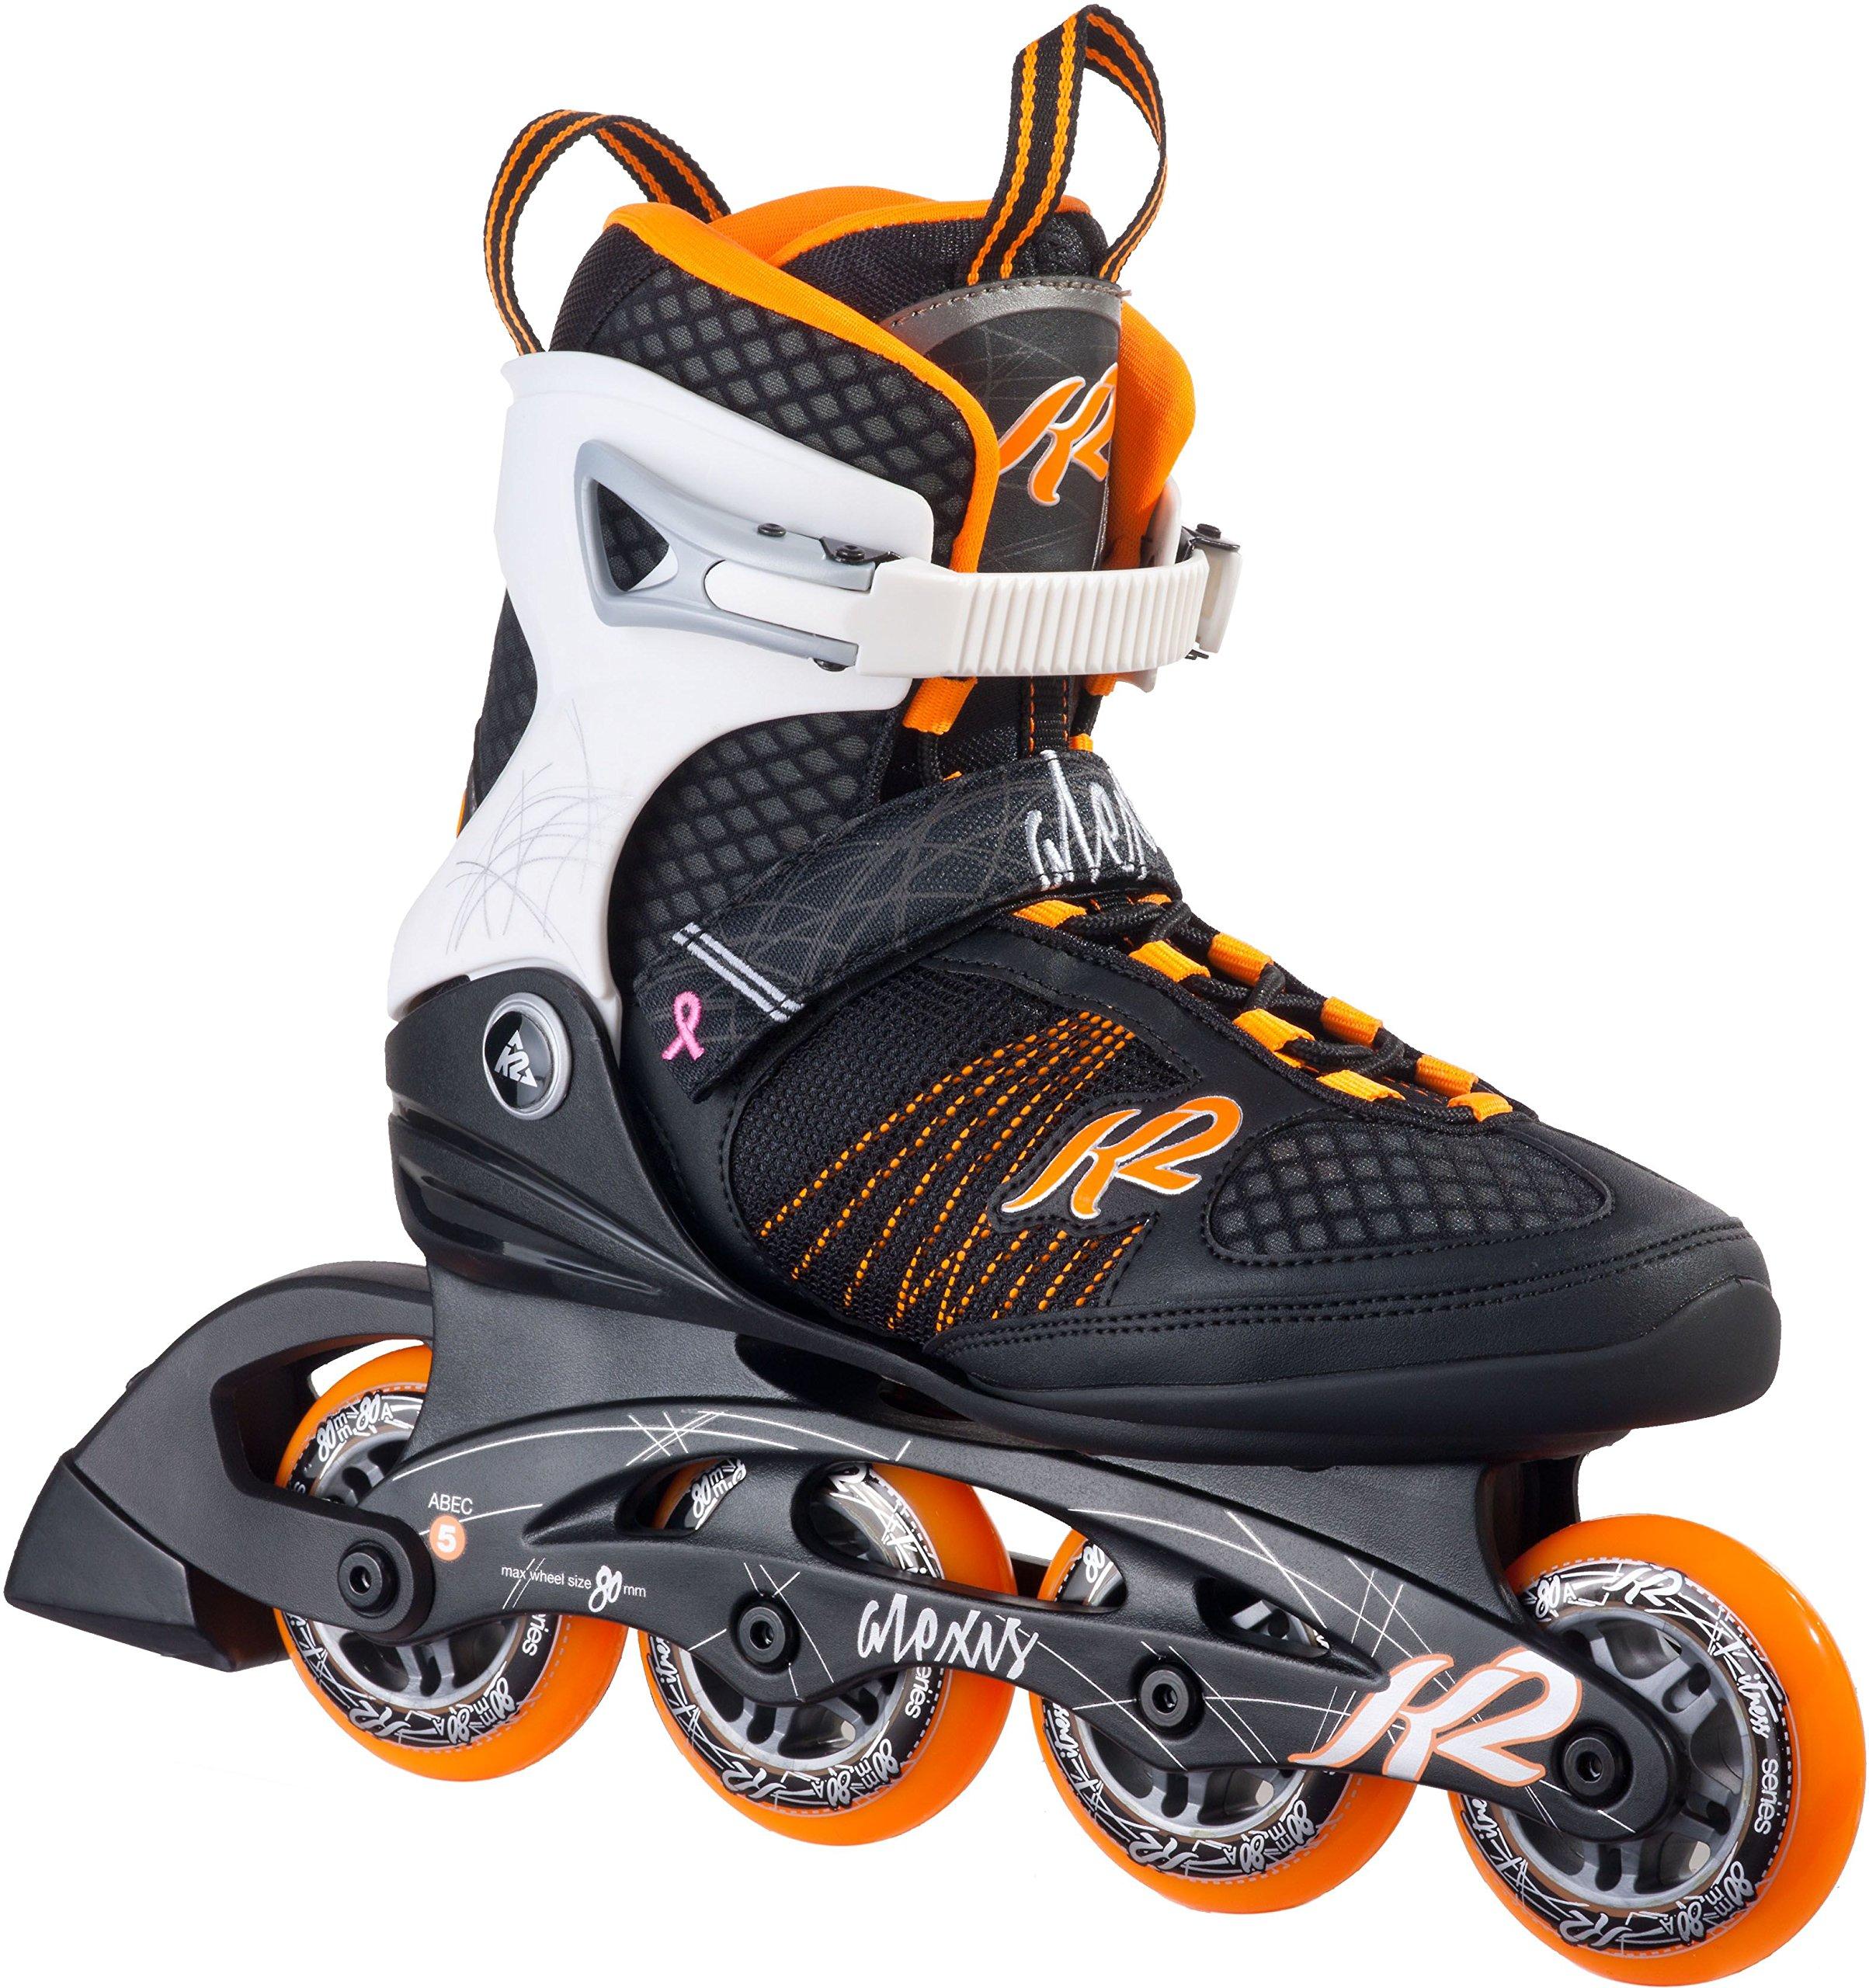 K2 Skate Women's Alexis 80 Inline Skates, Black/Tangerine, 10.5